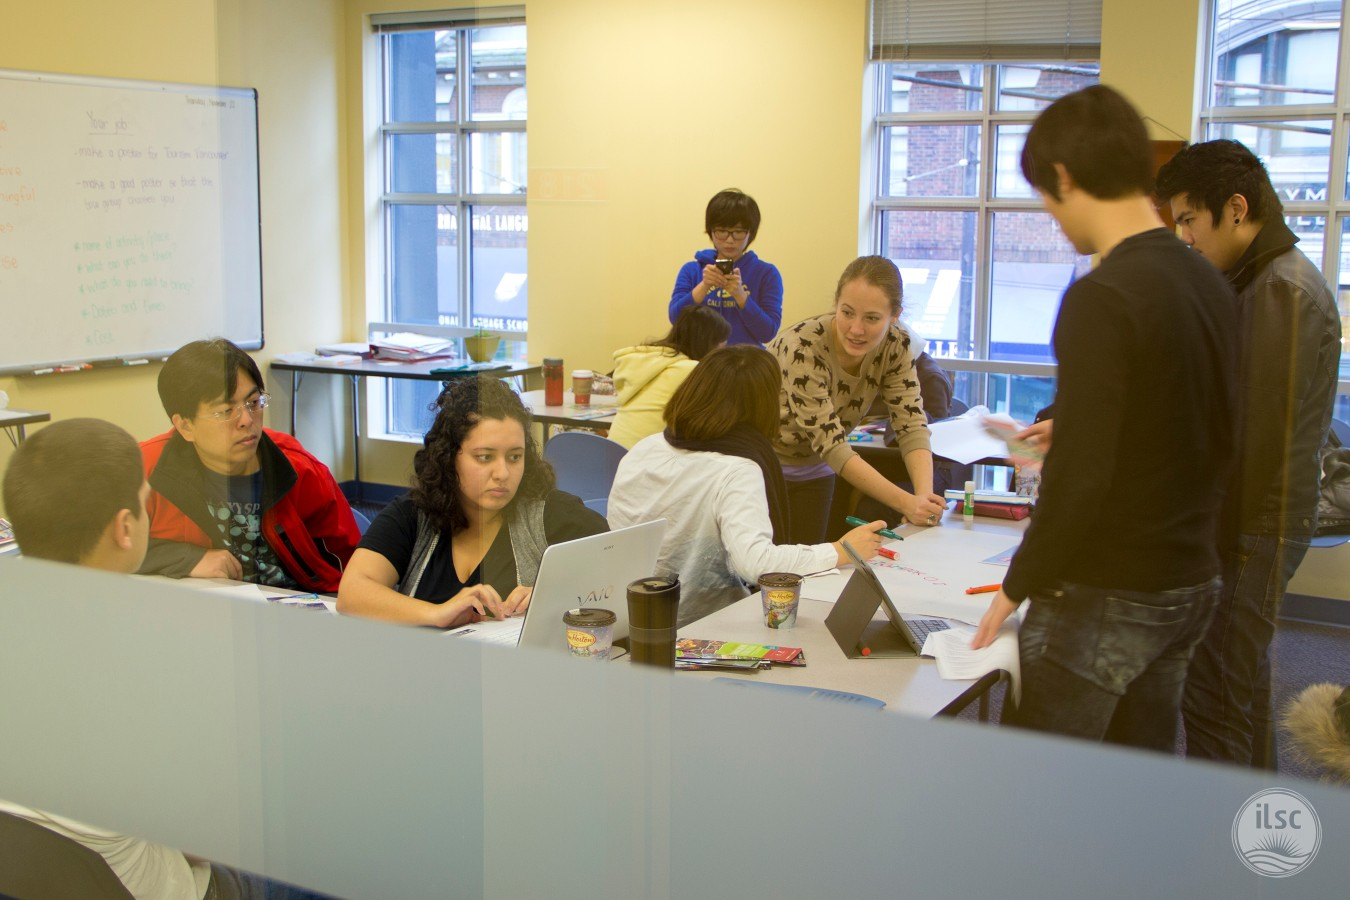 -agentsite-photo-list-ILSC-Vancouver-06_Classroom_04